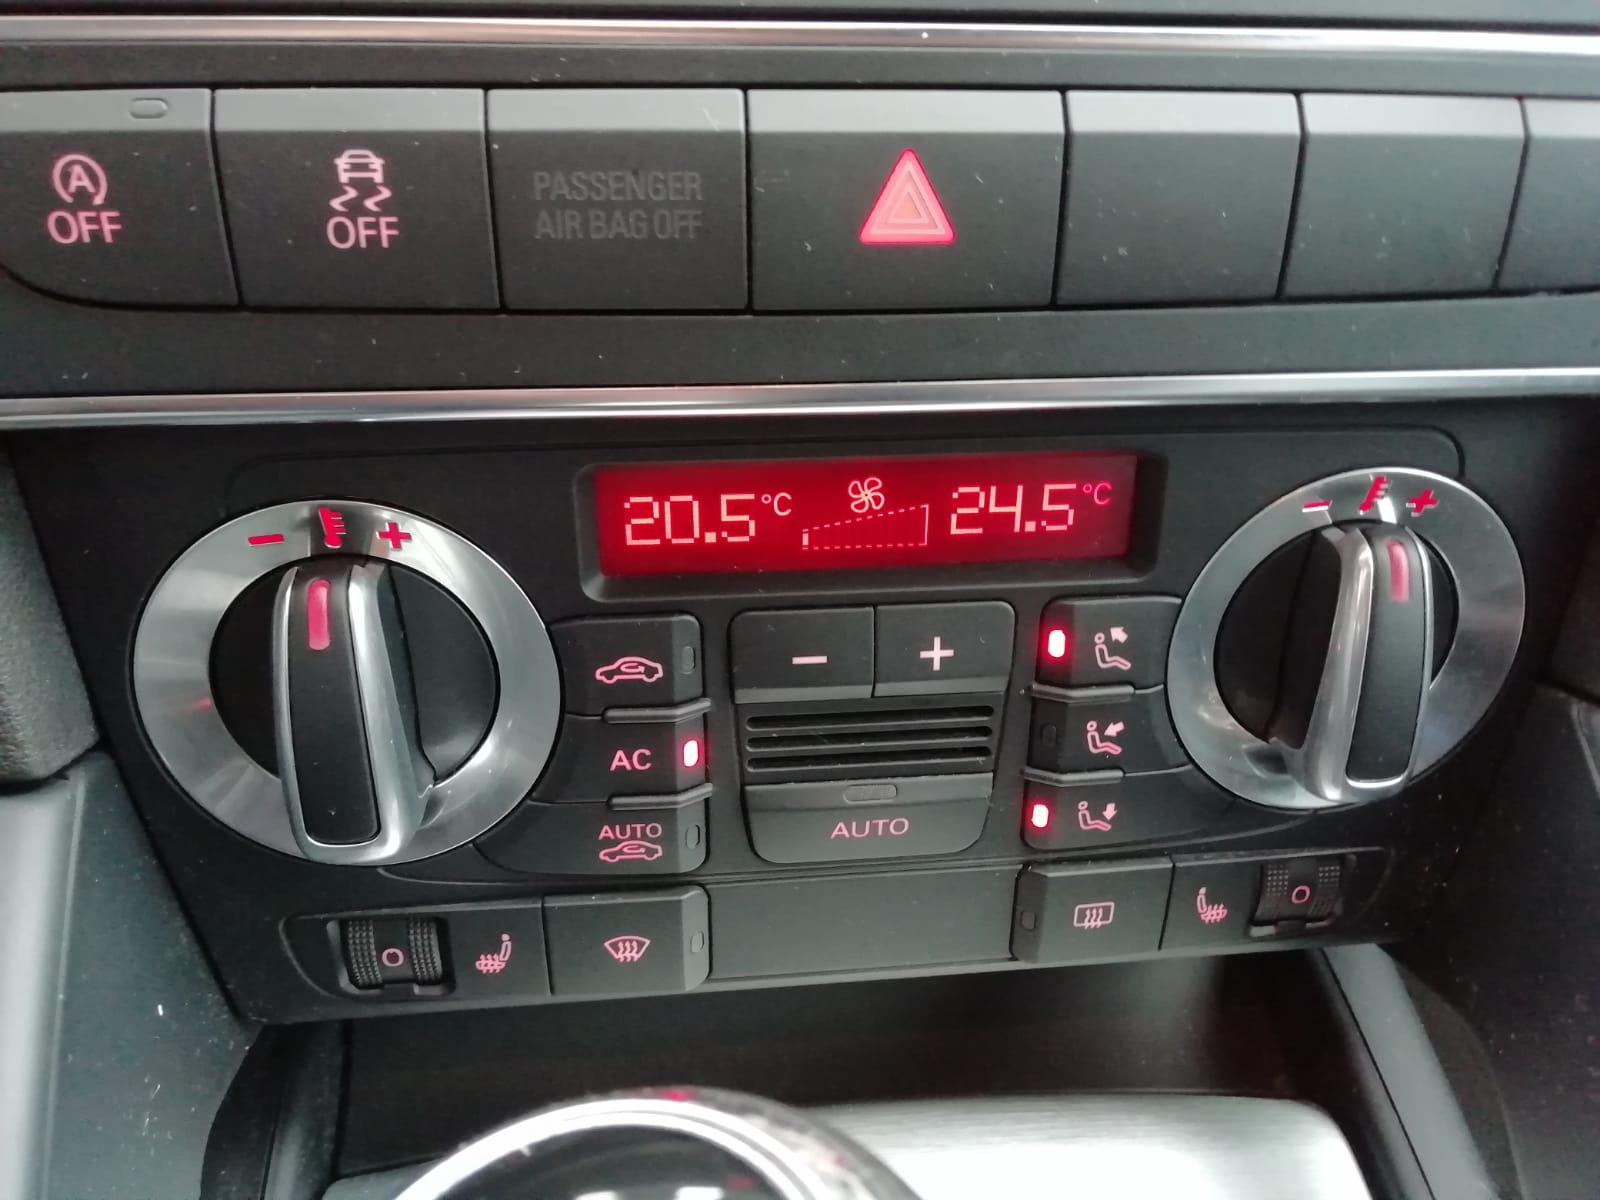 Audi A3 Sportback 2.0 TDI 140 cv S-Line